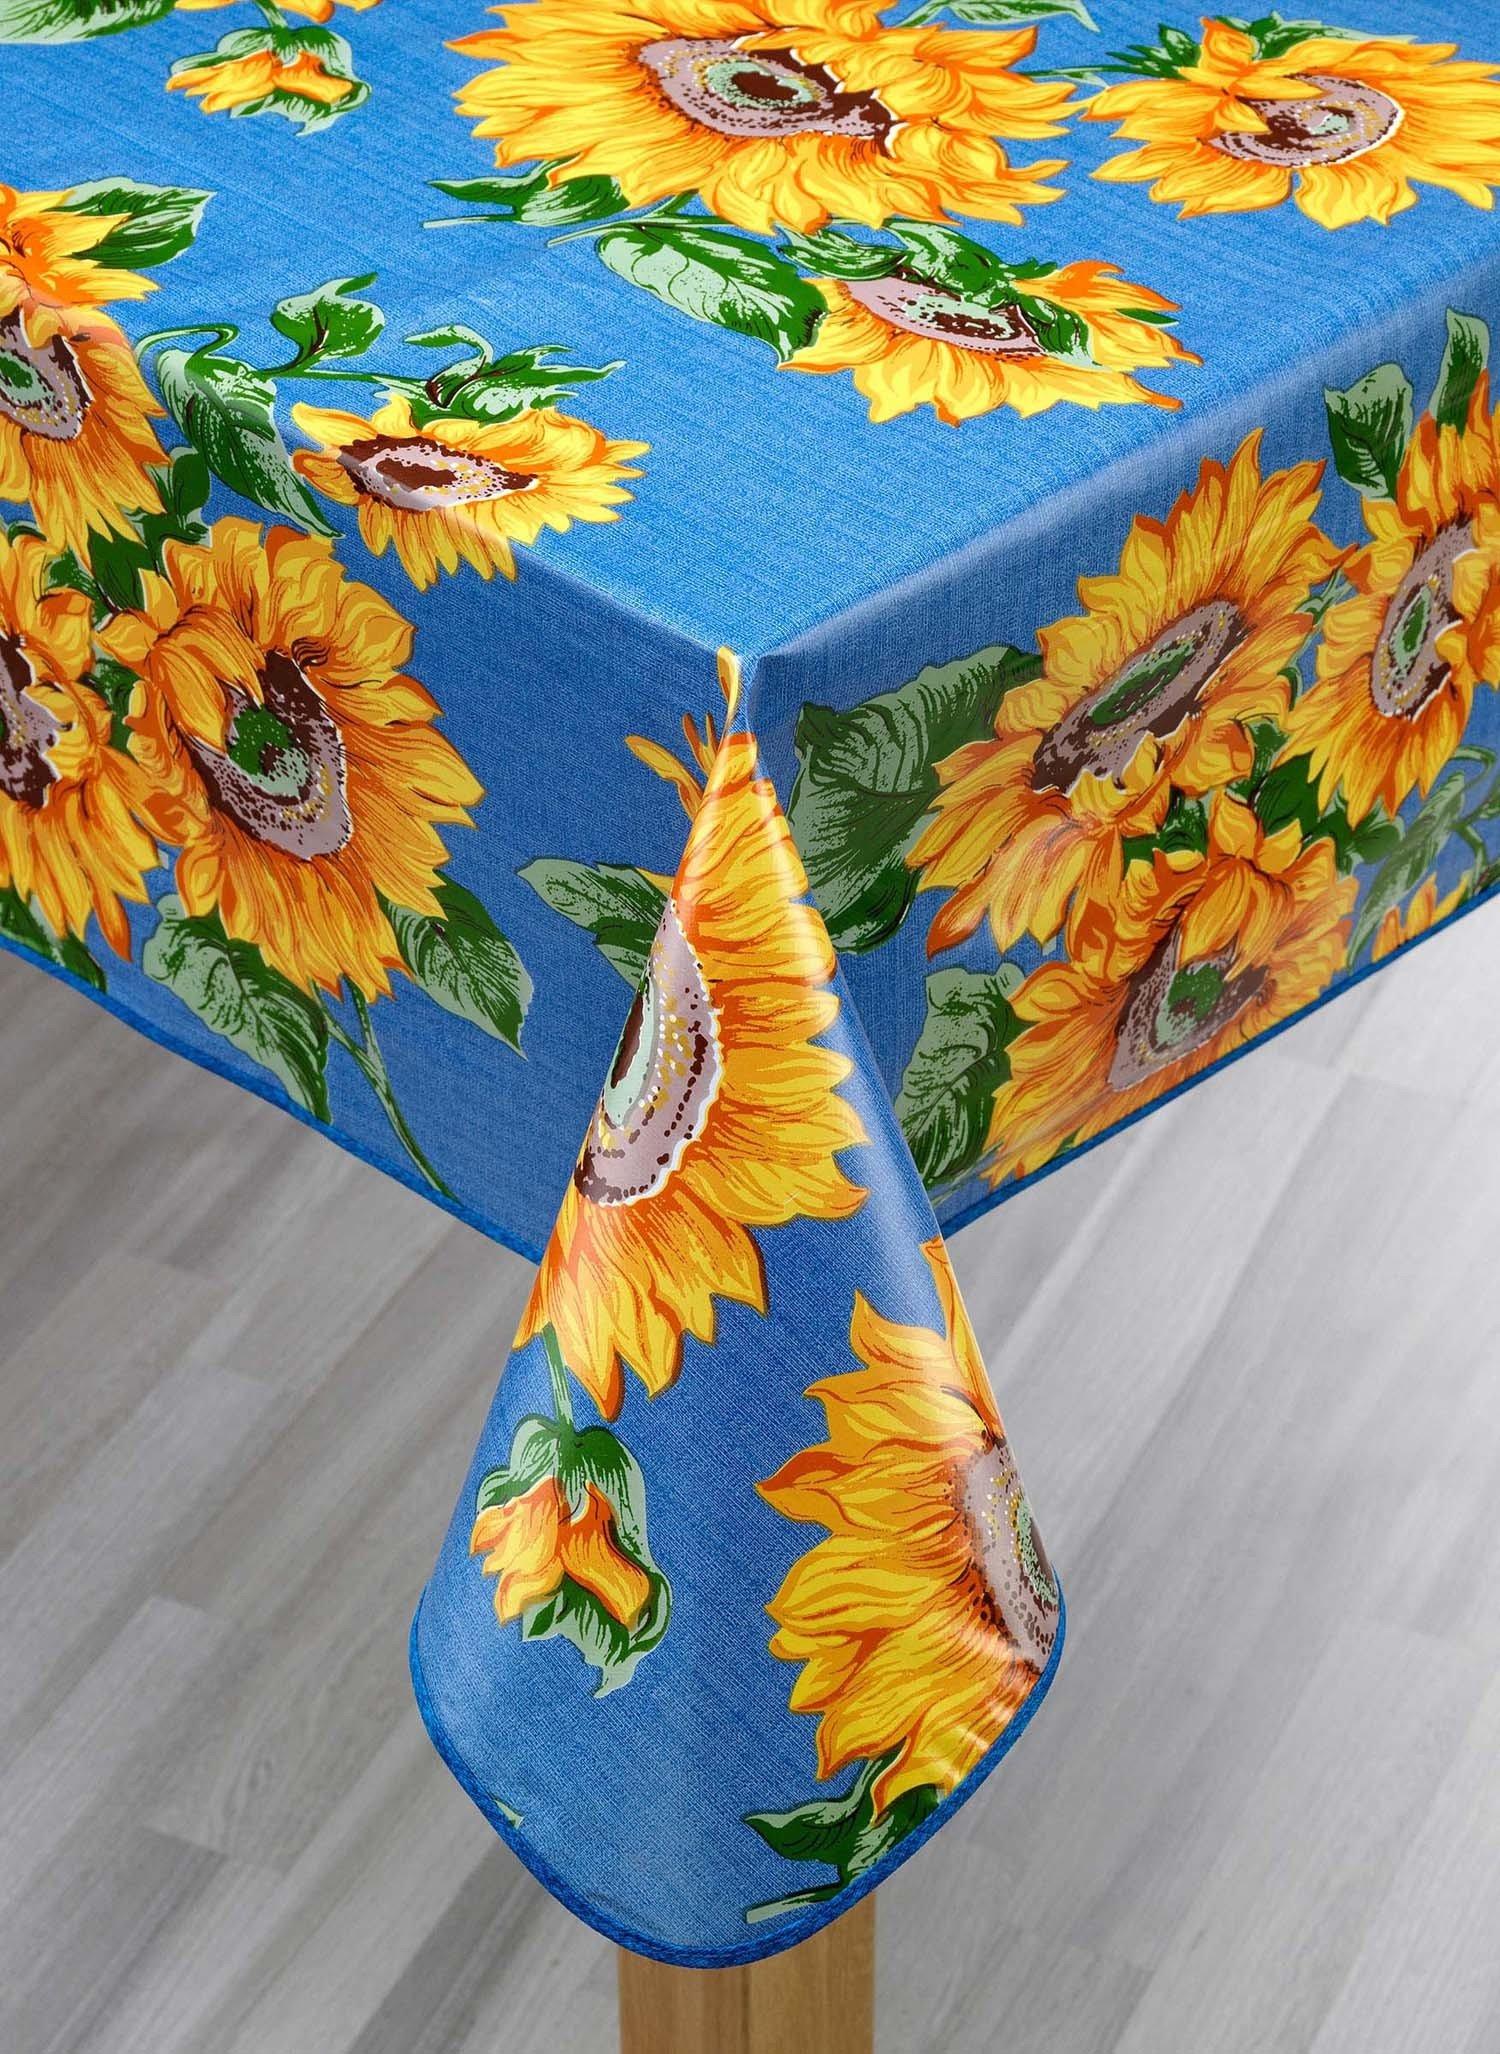 Tisch.Sonnenblume.blau 140x180 - 3 - Ronja.ch